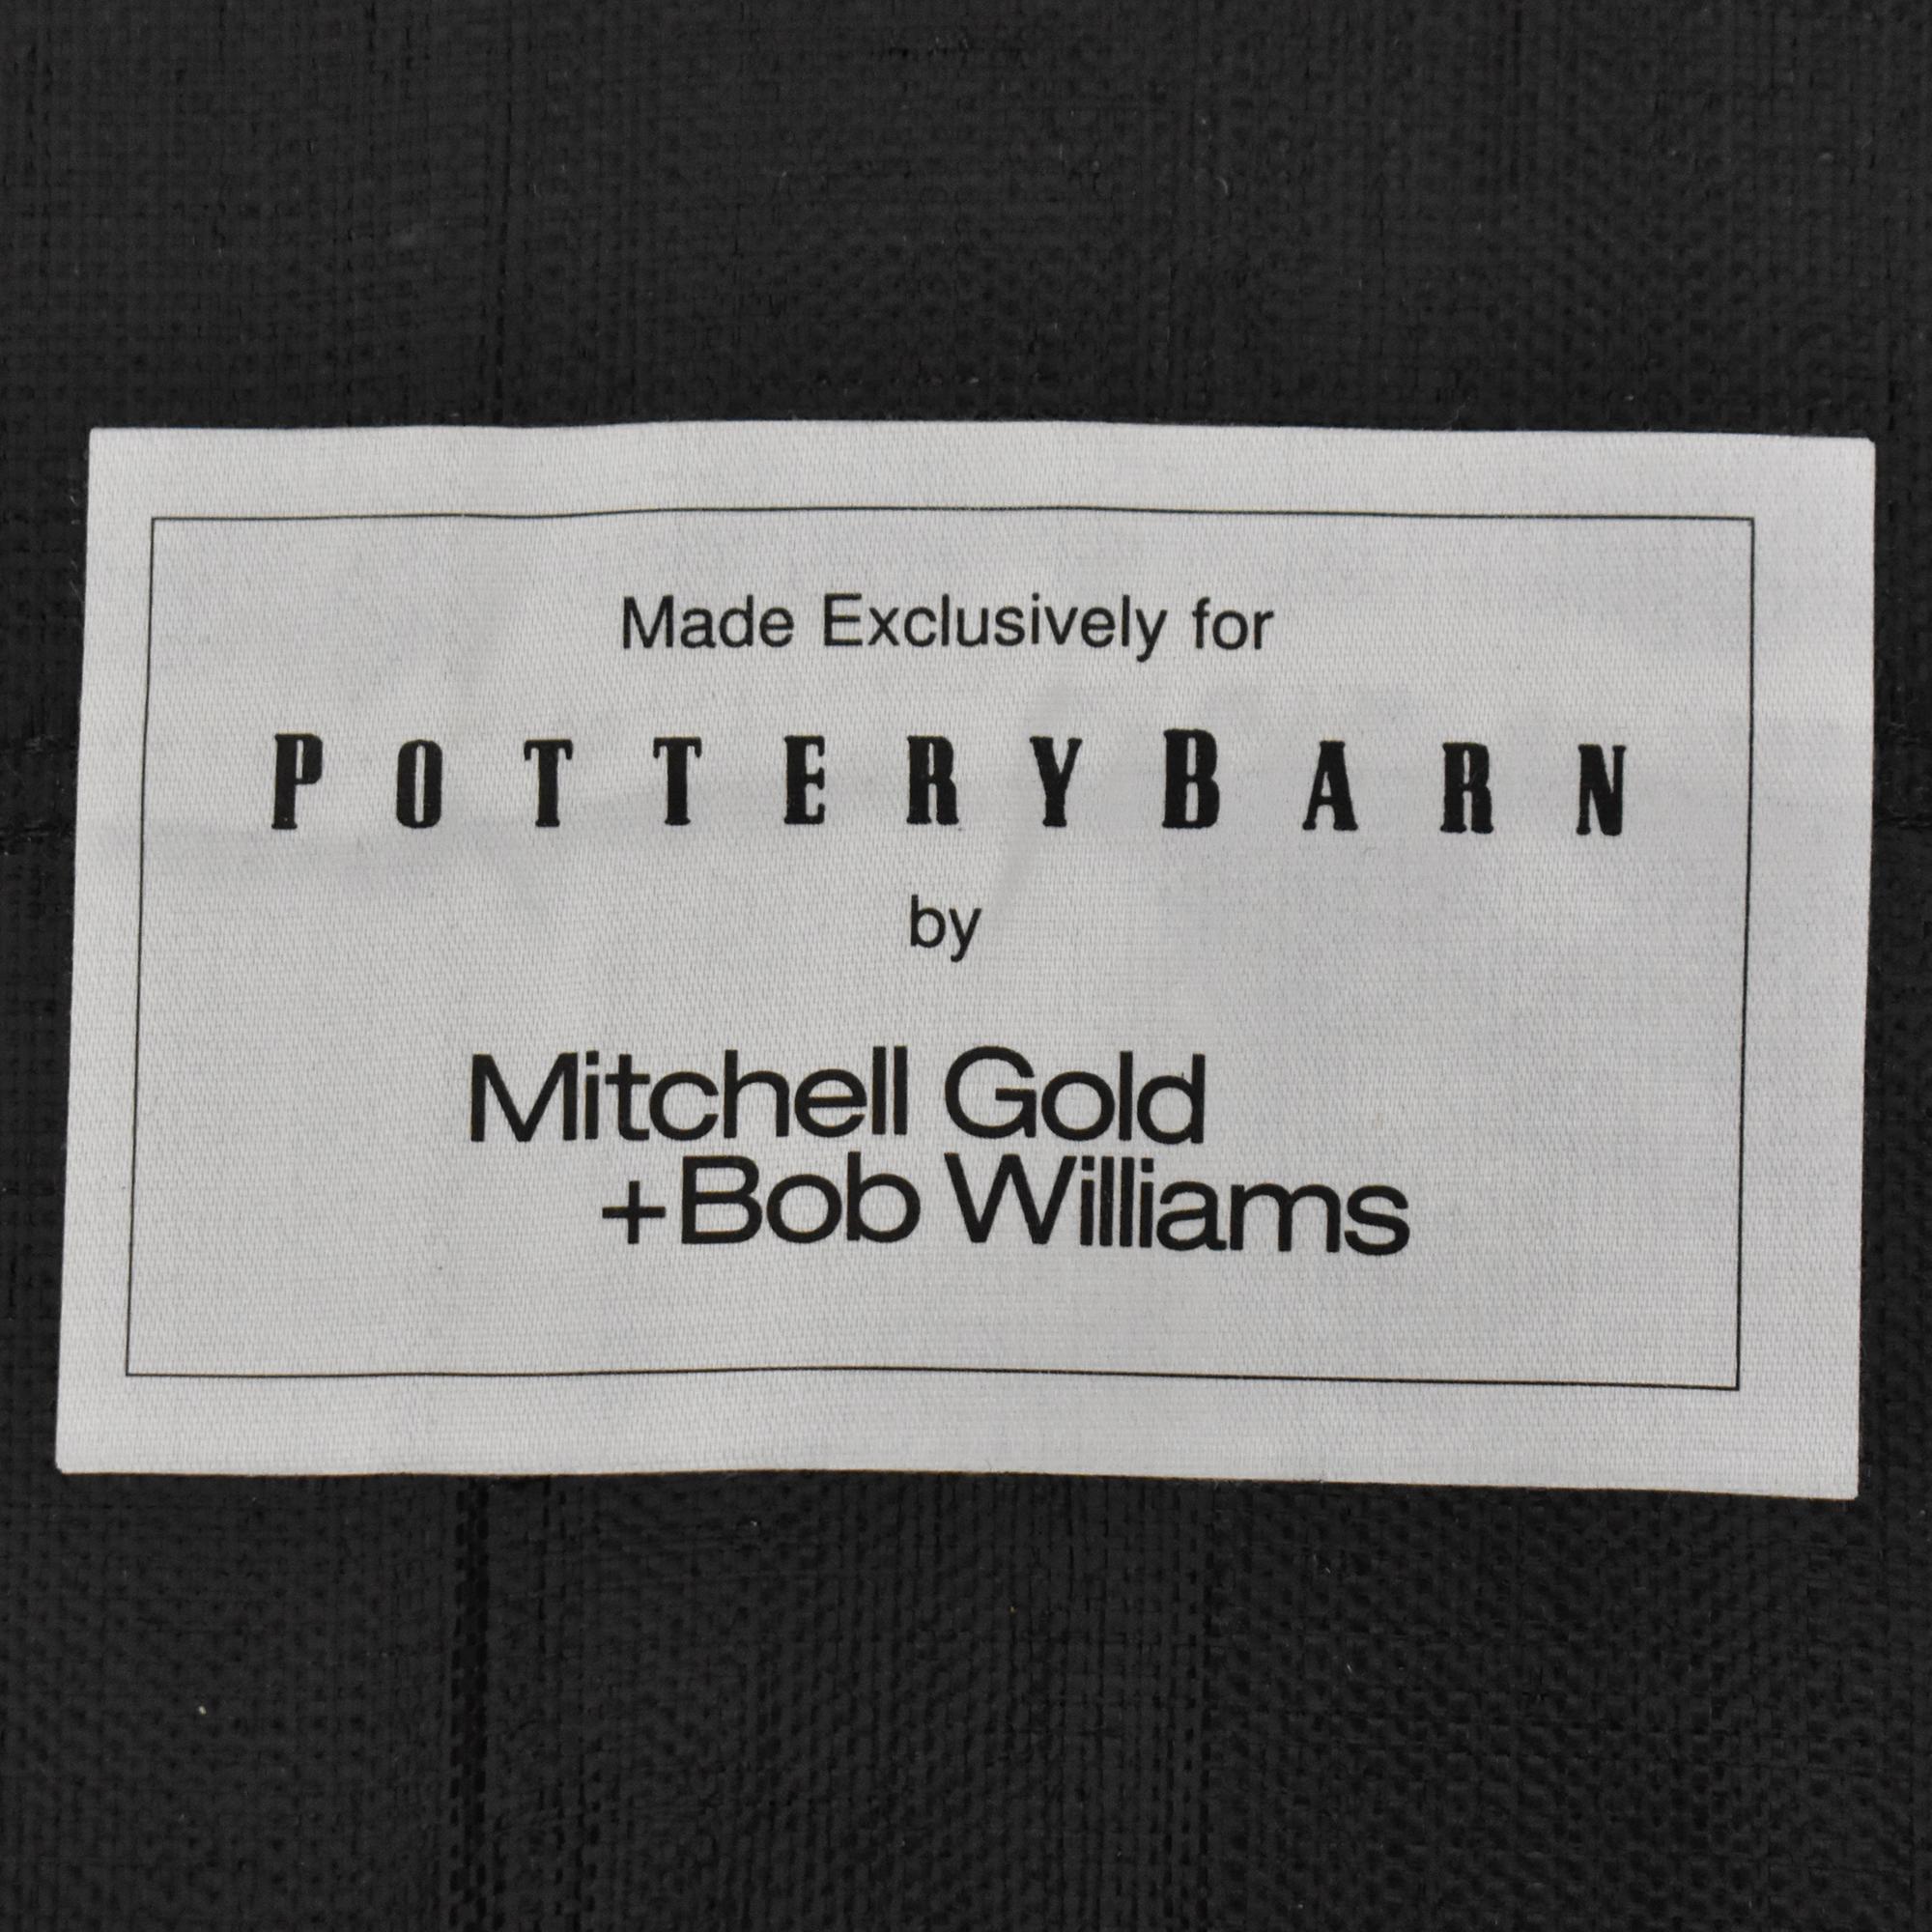 Pottery Barn Pottery Barn Sleeper Sofa by Mitchell Gold + Bob Williams second hand